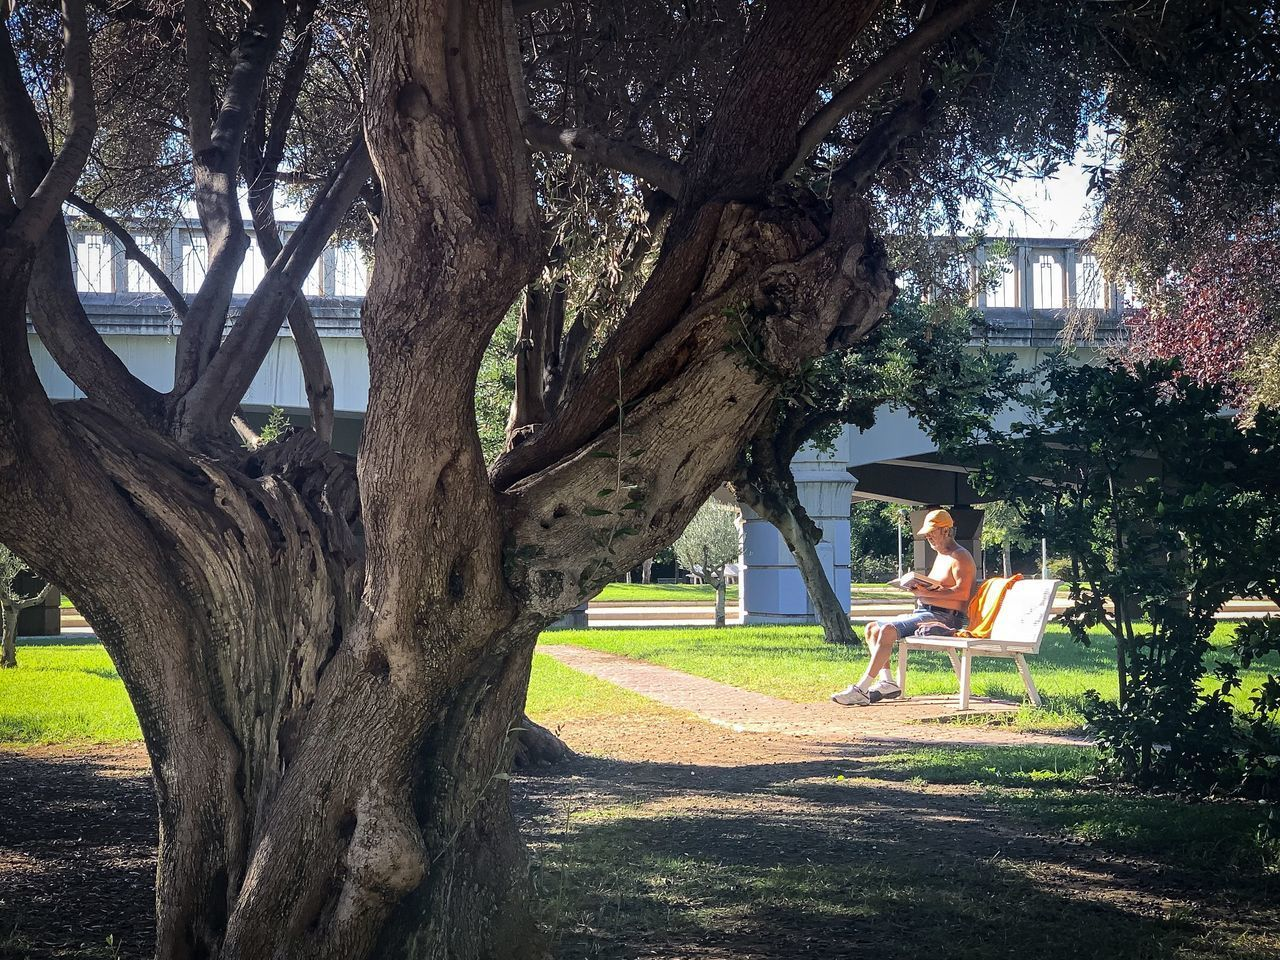 PORTRAIT OF TREE IN PARK